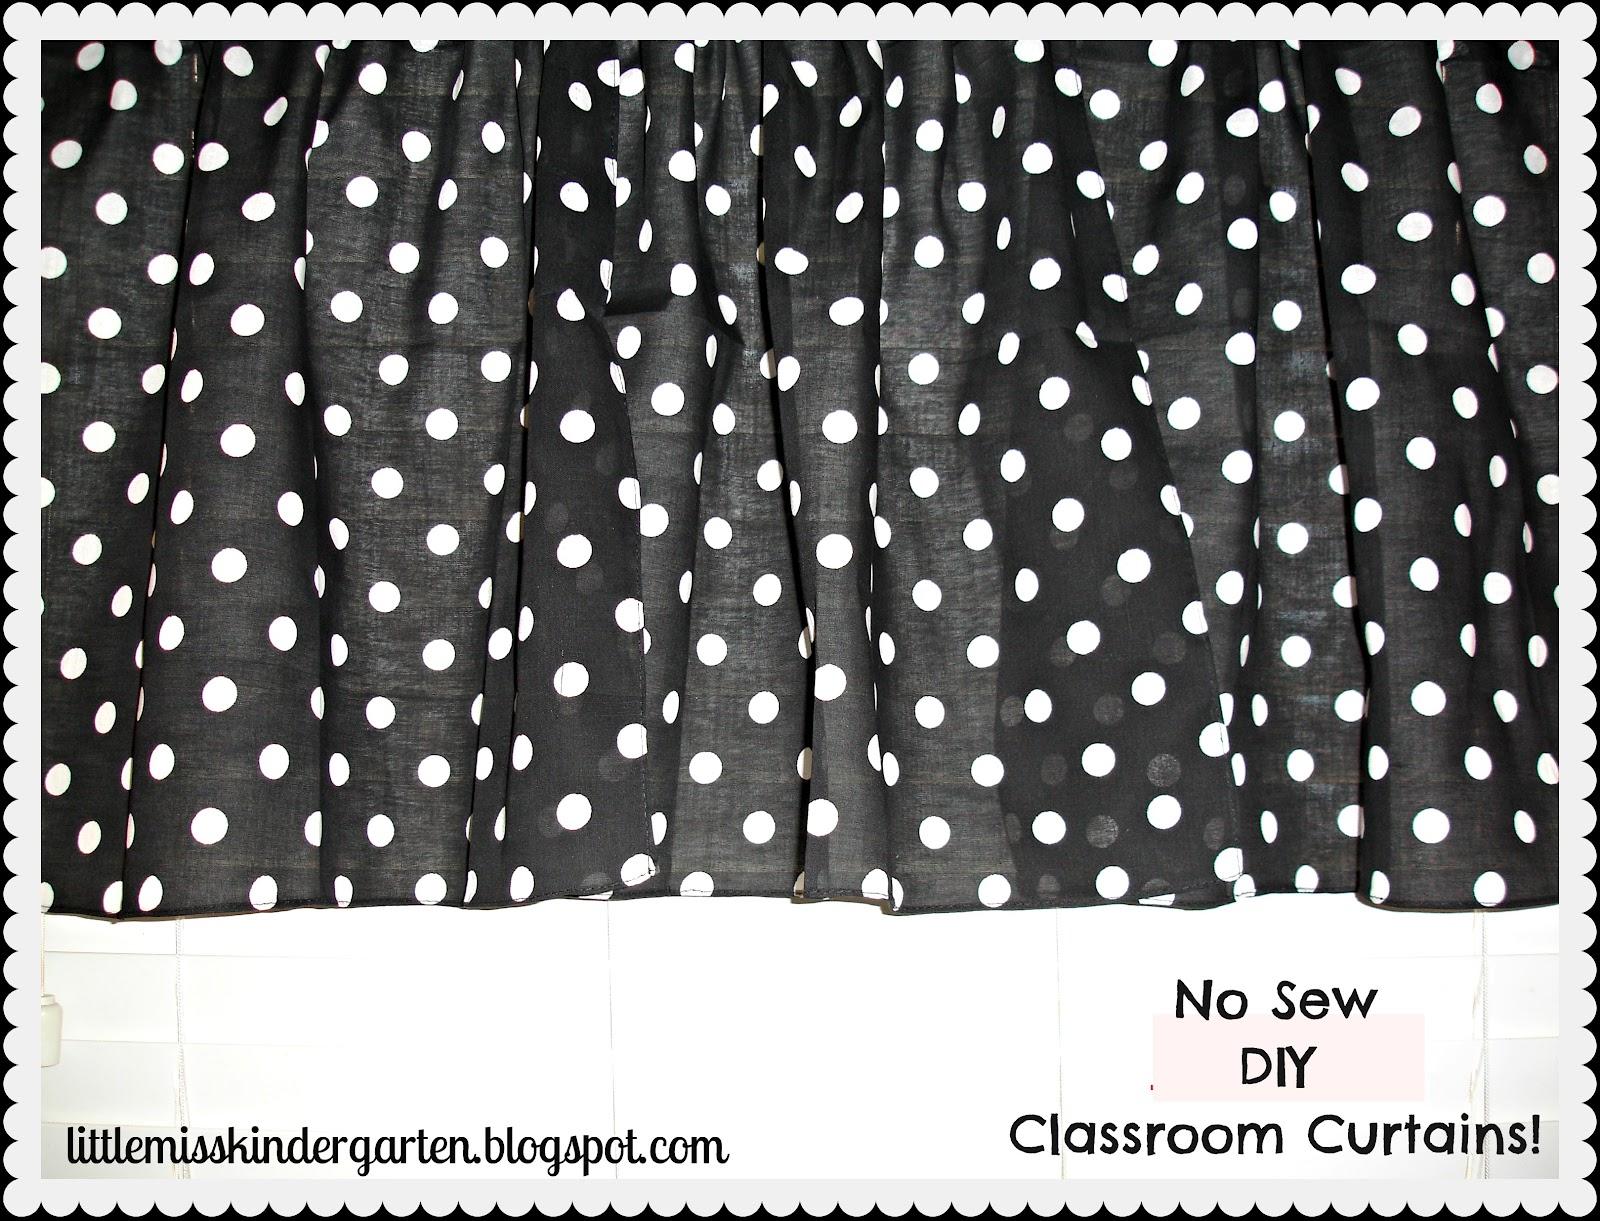 Classroom Diy Diy No Sew Classroom Curtains